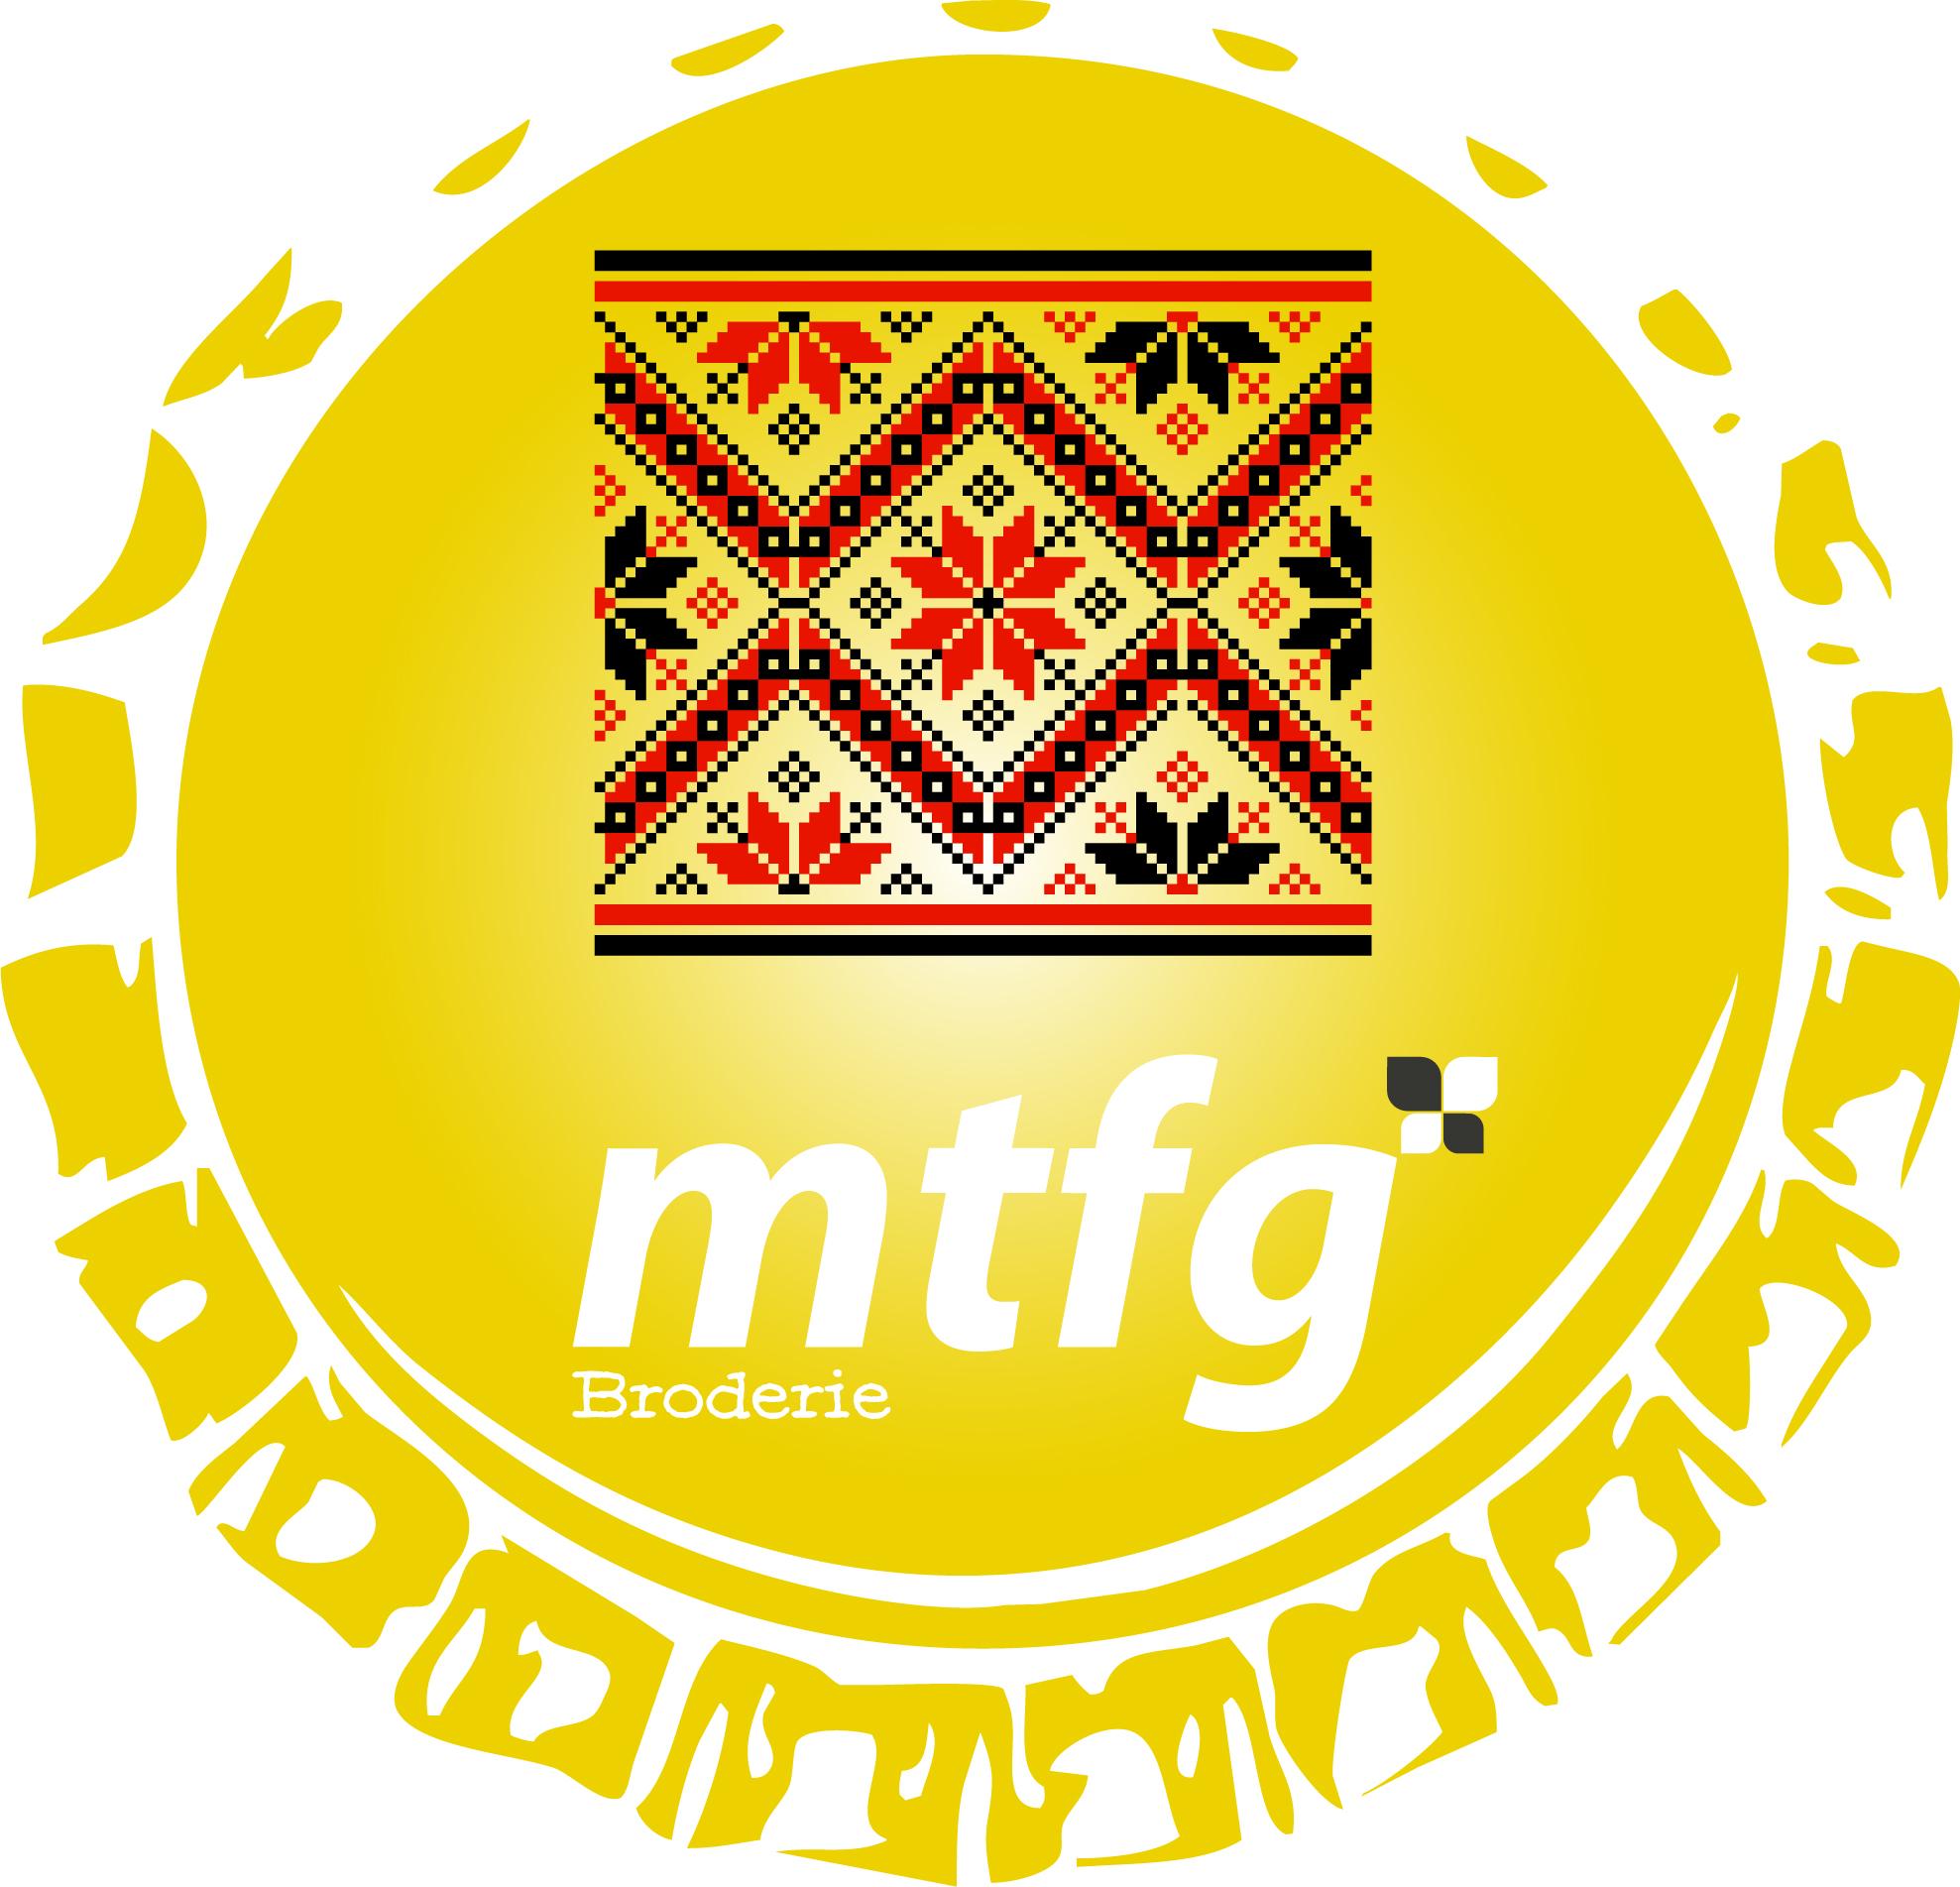 MTFG Broderie